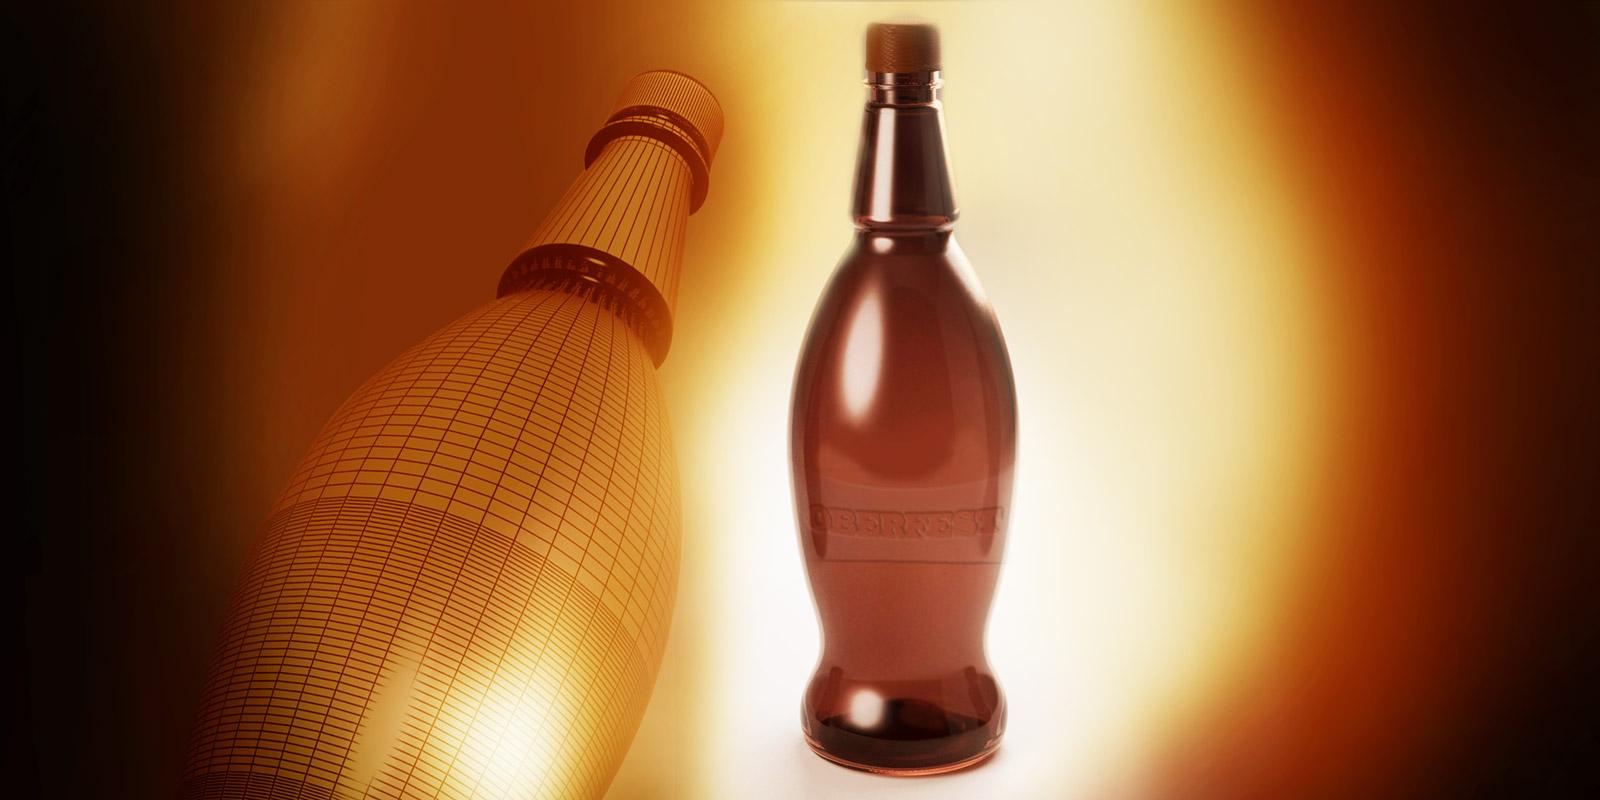 TM Oberfest;;;;;;Дизайн бутылки (ПЭТ);;;;;;<span>Клиент:</span> TM Oberfest;;;;;;;;;;;;Дизайн бутылки (ПЭТ);;;;;;7